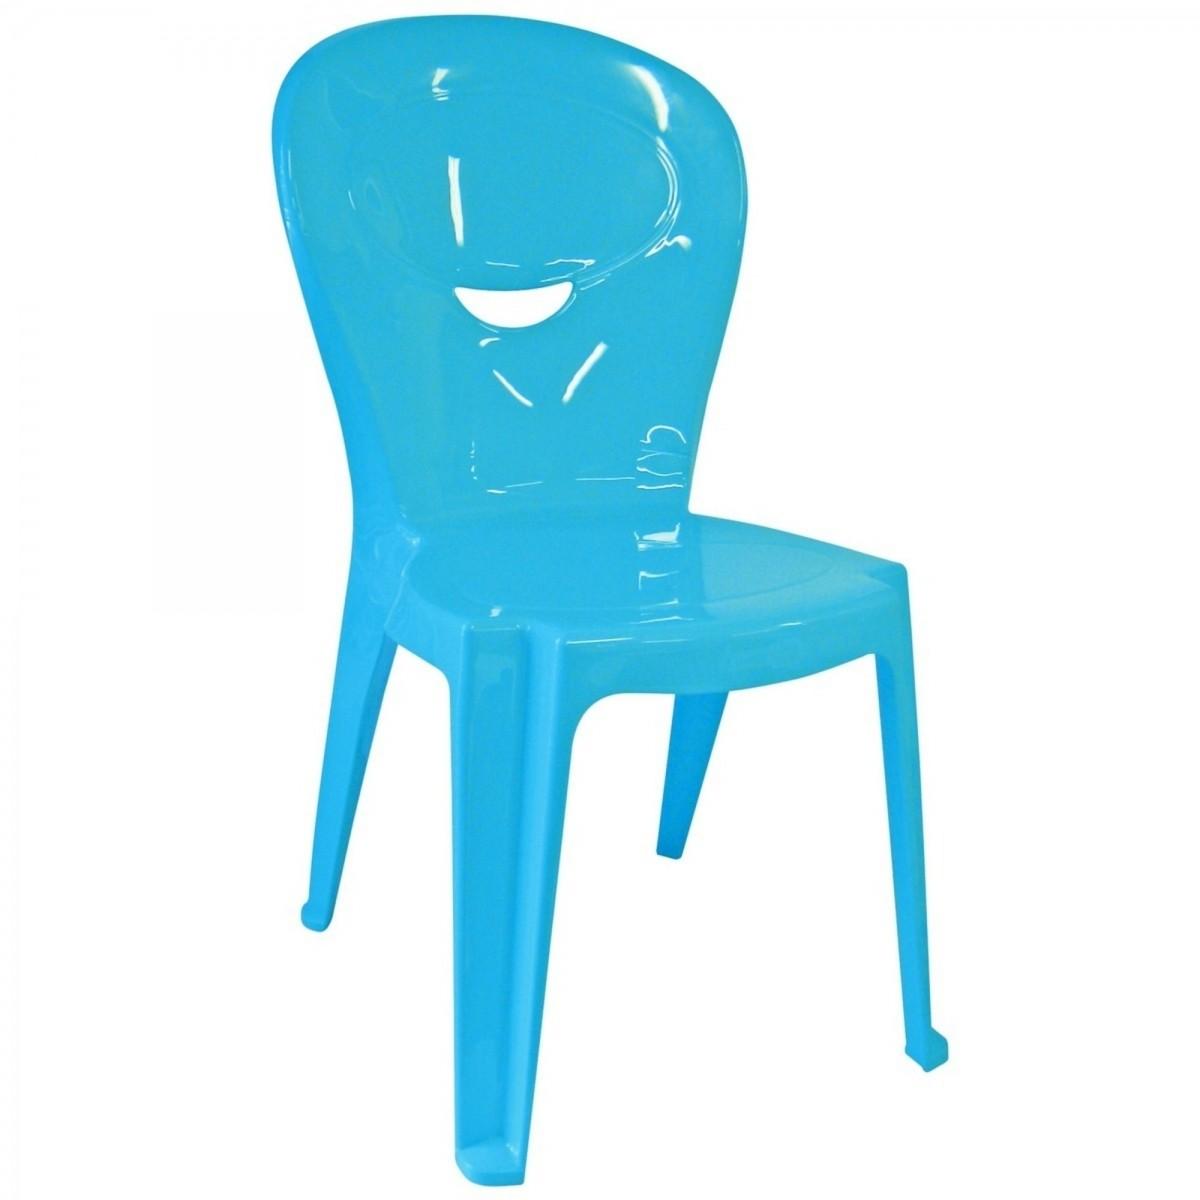 Cadeira Vice Ref. 92270/070 Tramontina Azul